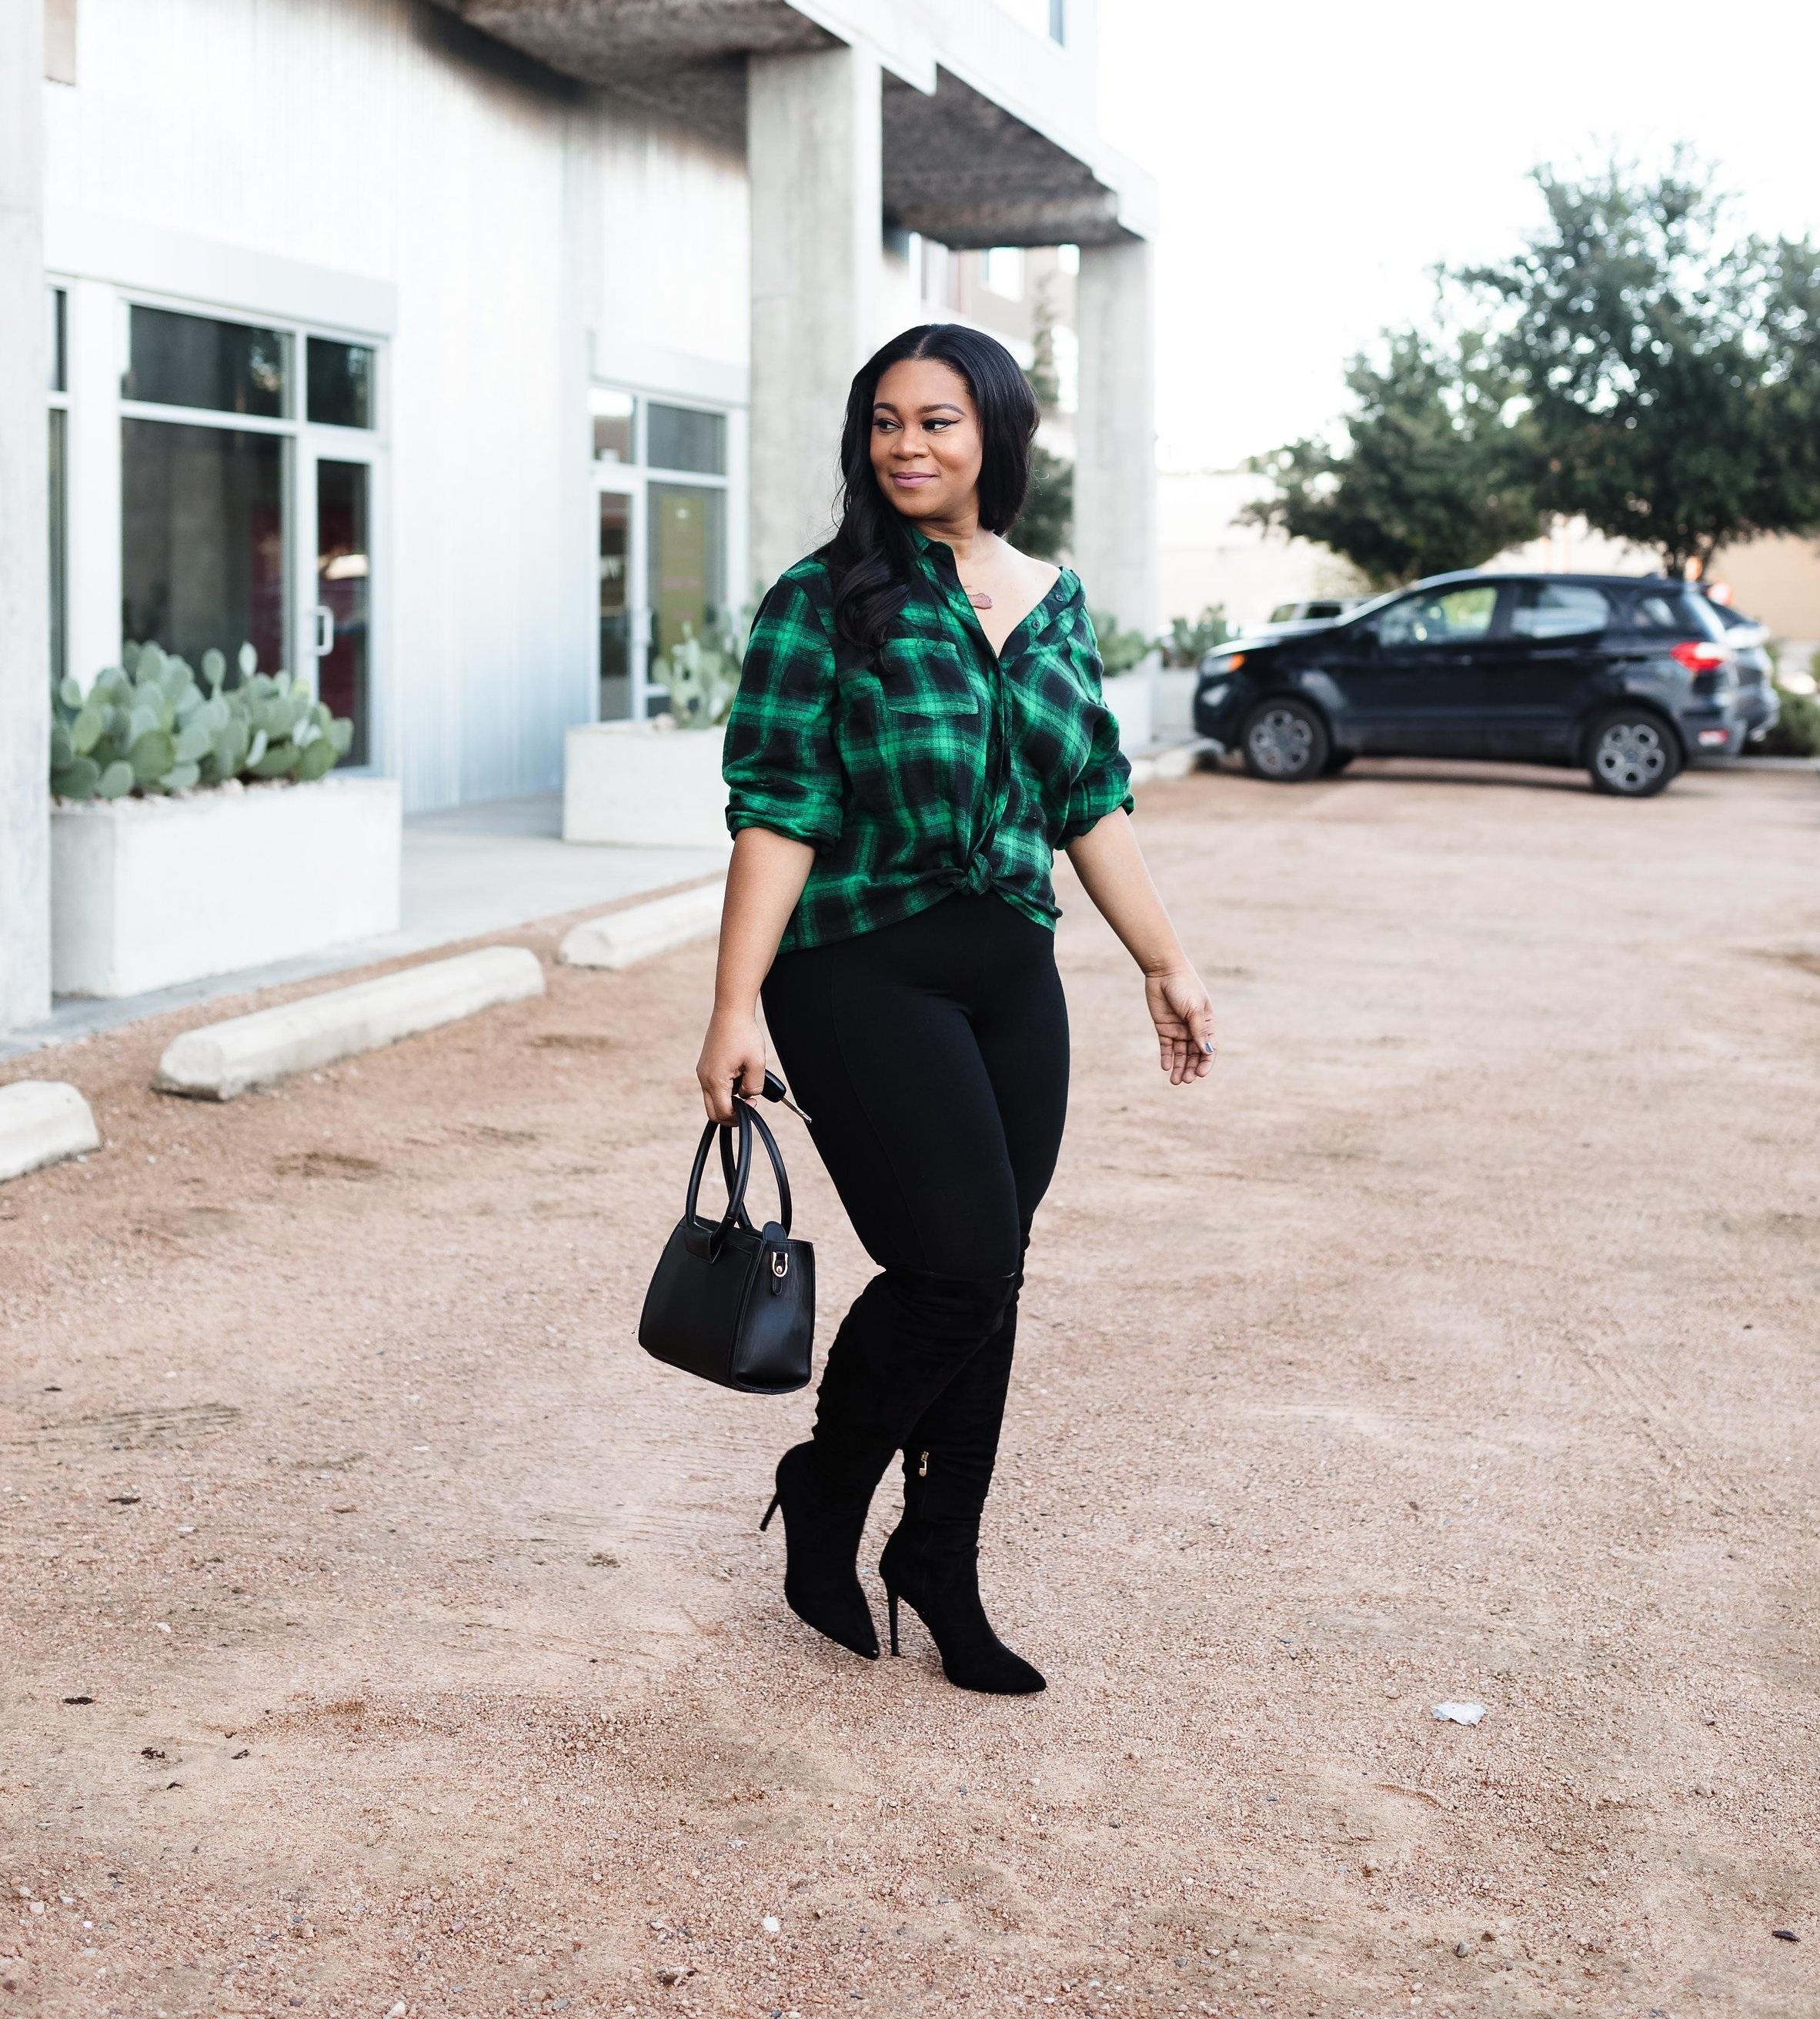 Plaid Flannel Shirt Outfit - Natalie Greagor.jpg